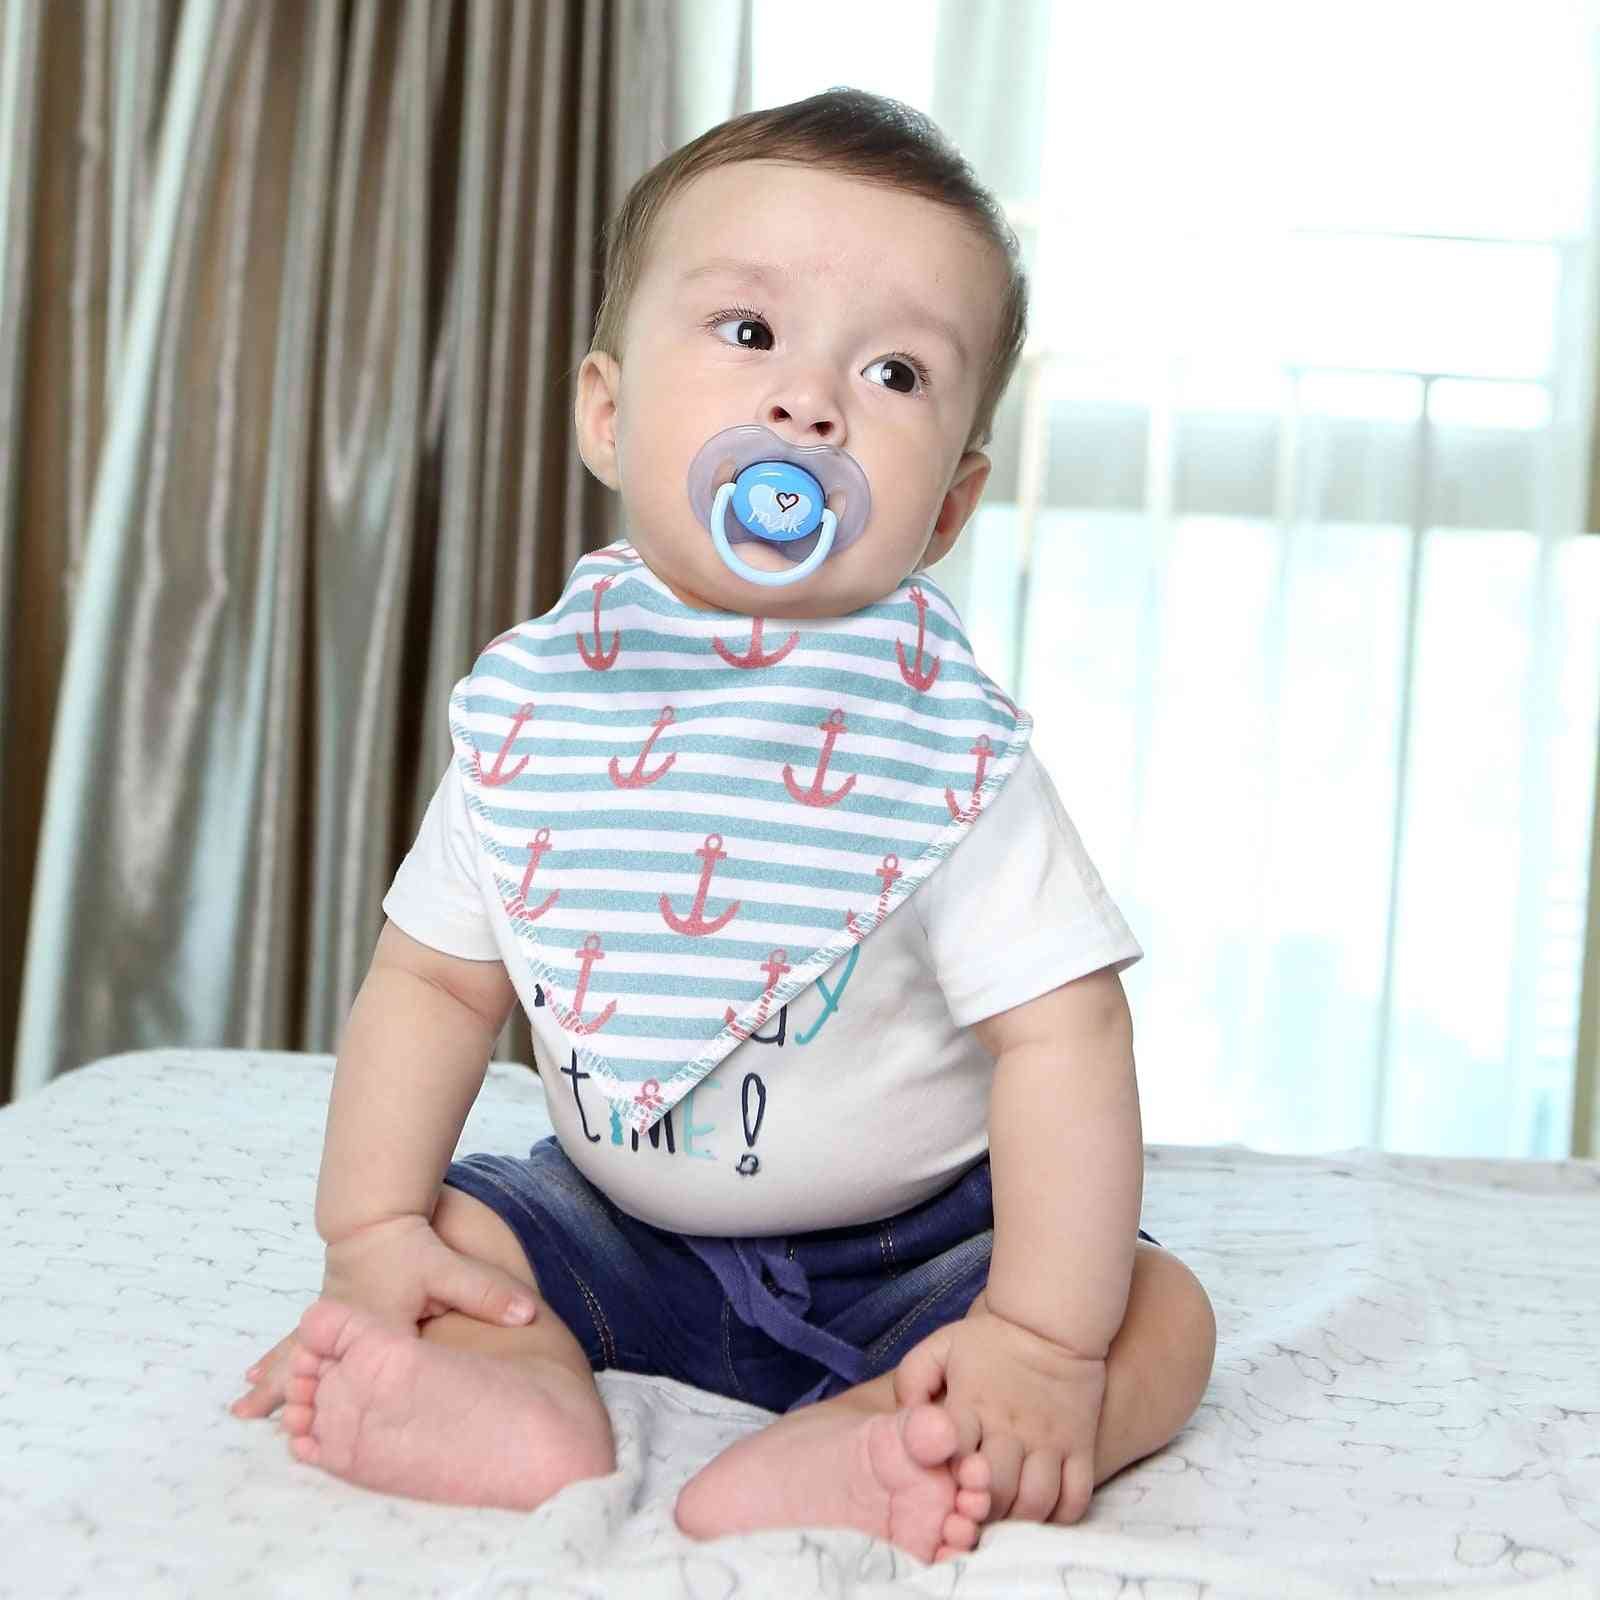 100% Organic Cotton Baby Bandana Feeding Bibs For Drooling And Teething